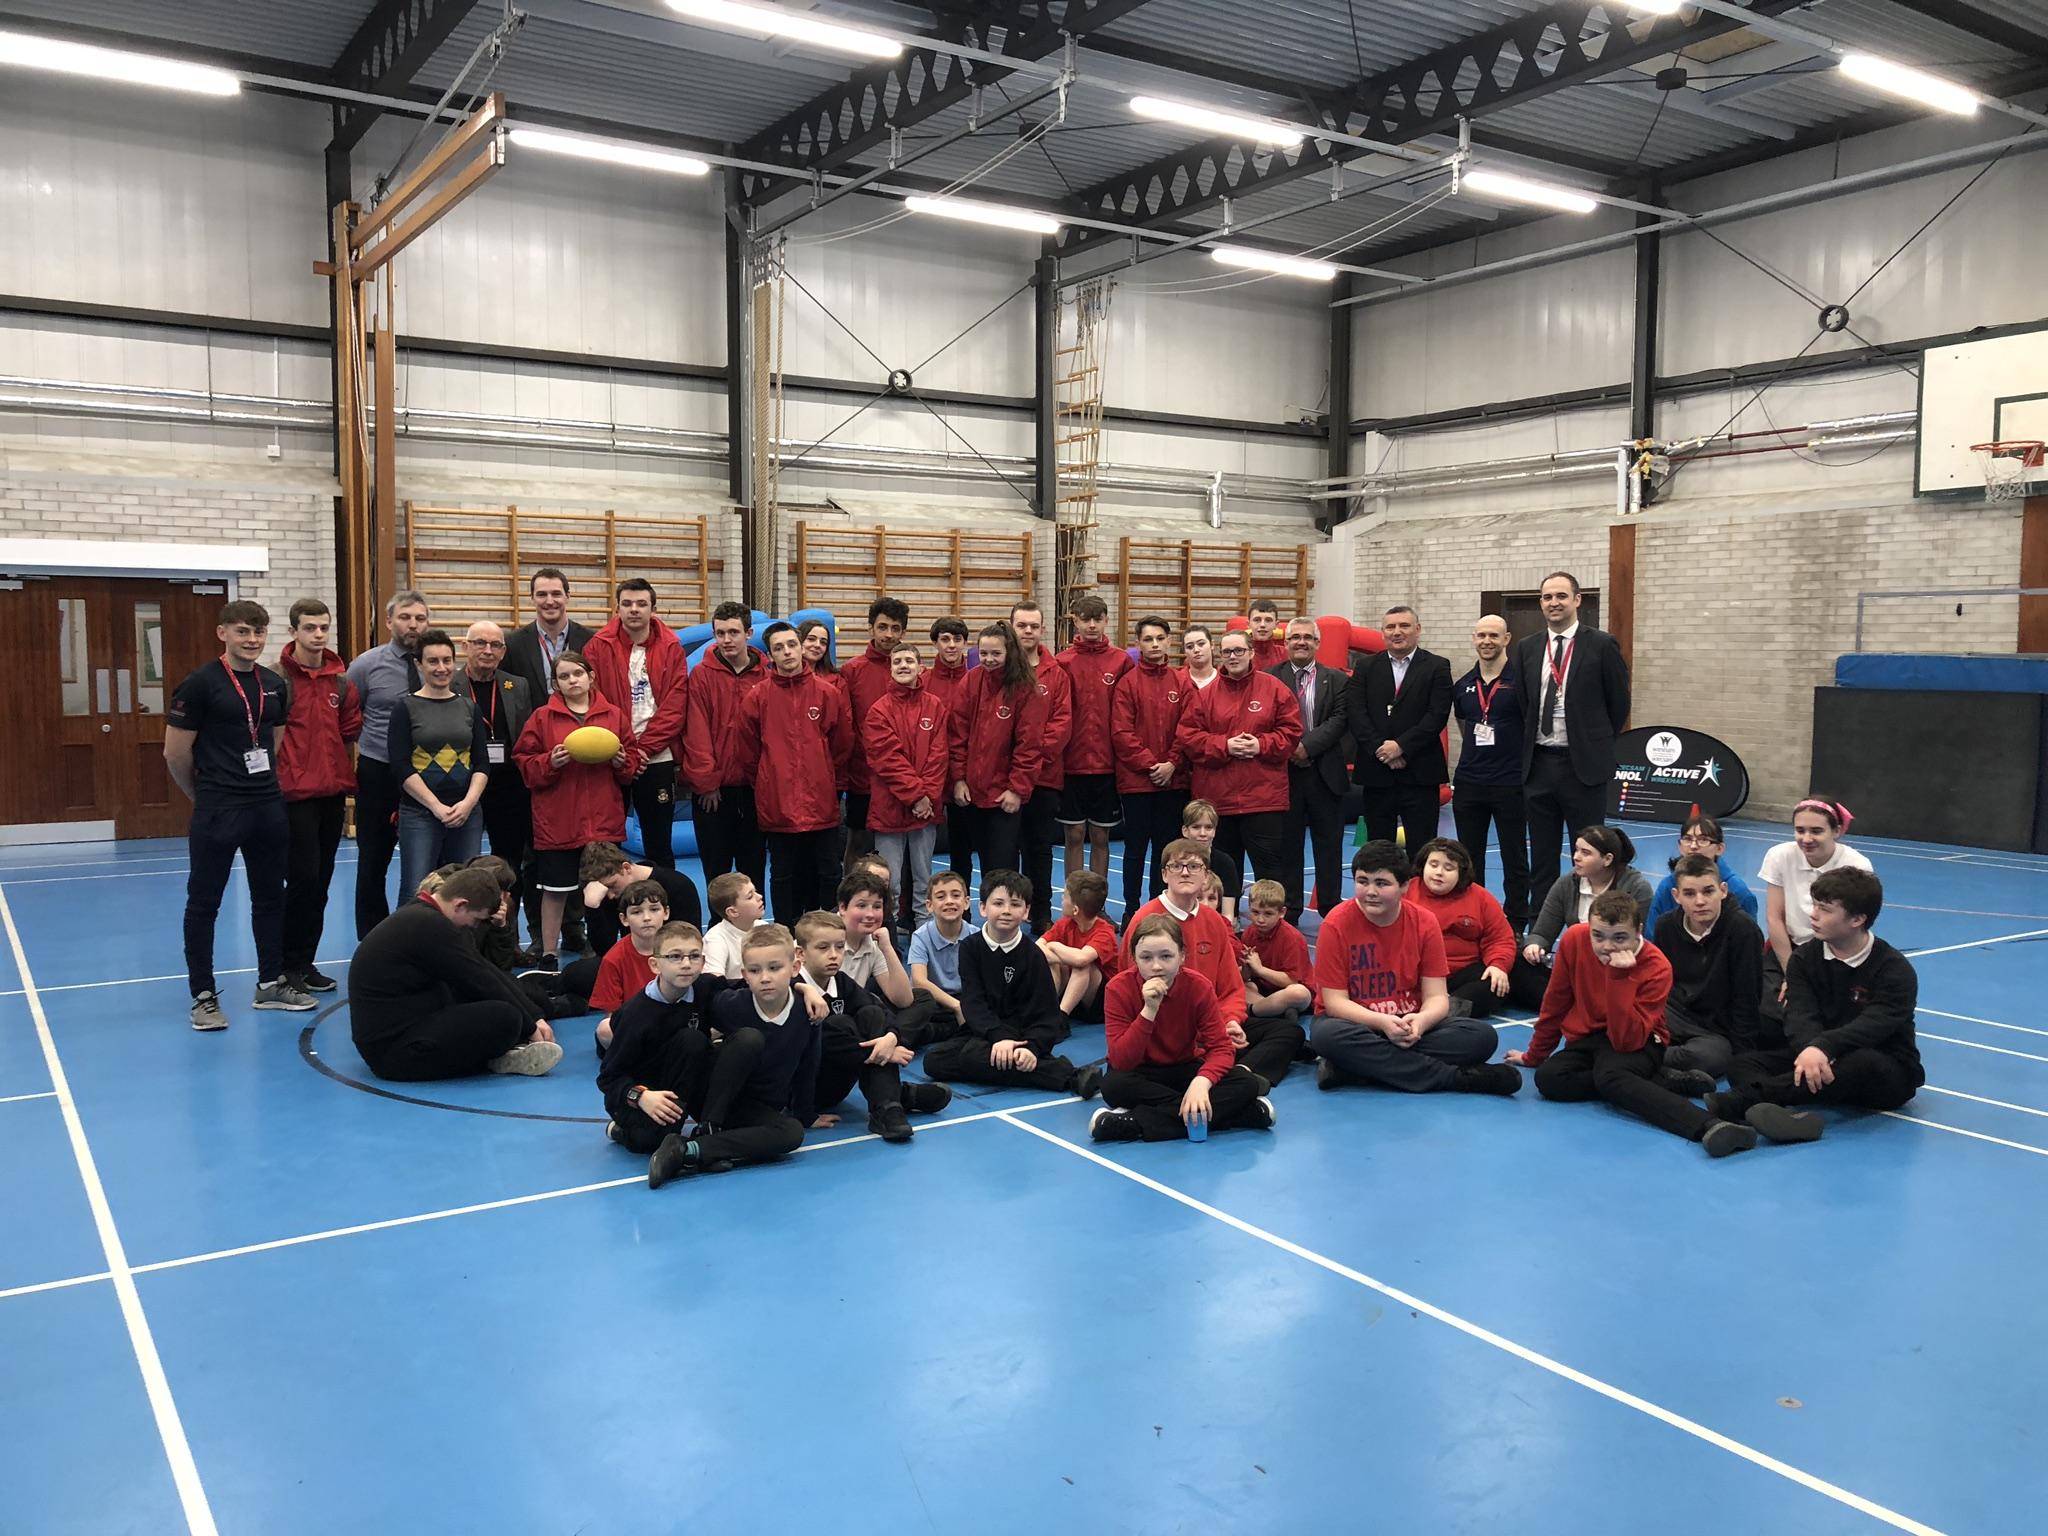 Sport Wales visit